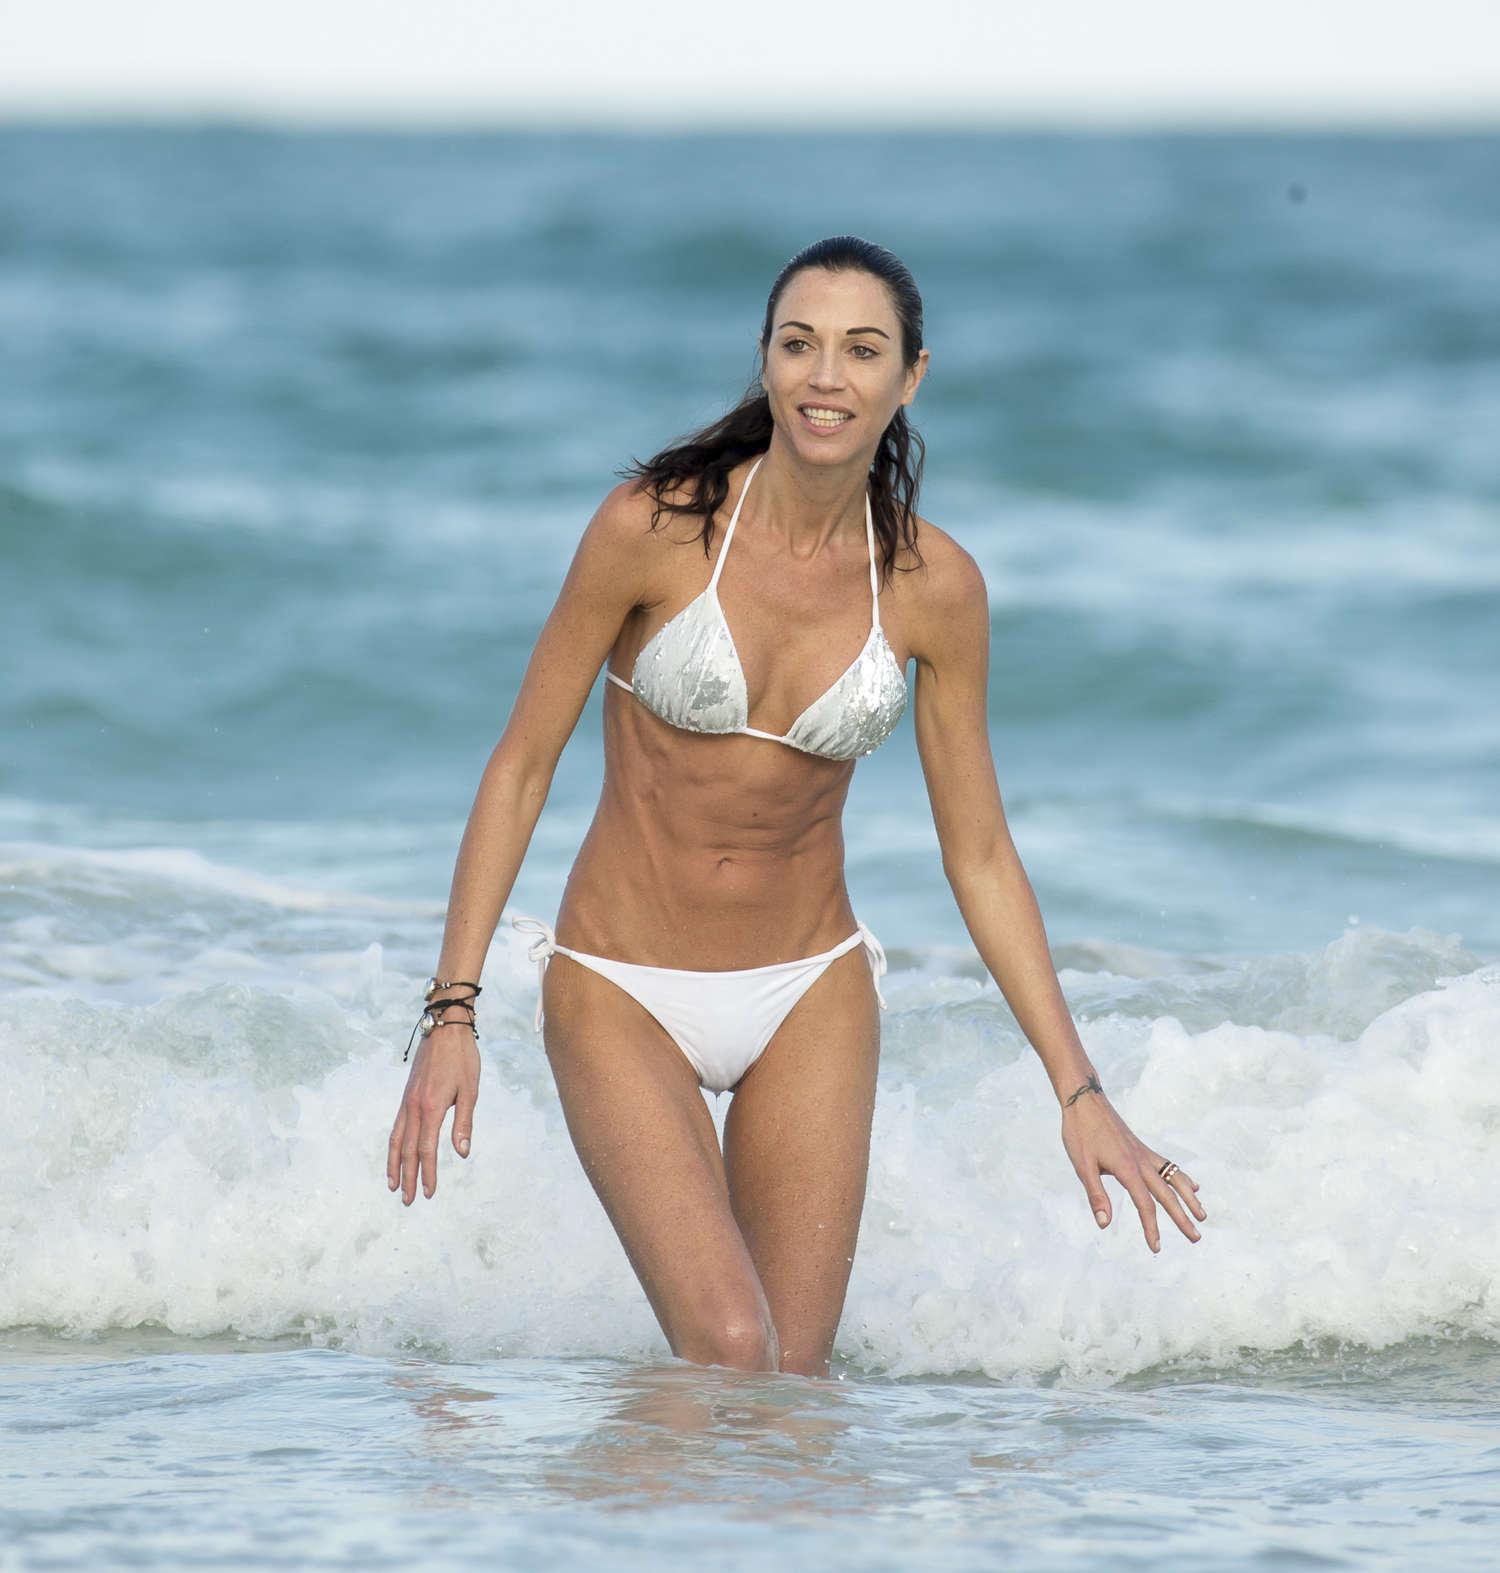 Hot italian woman bent over naked